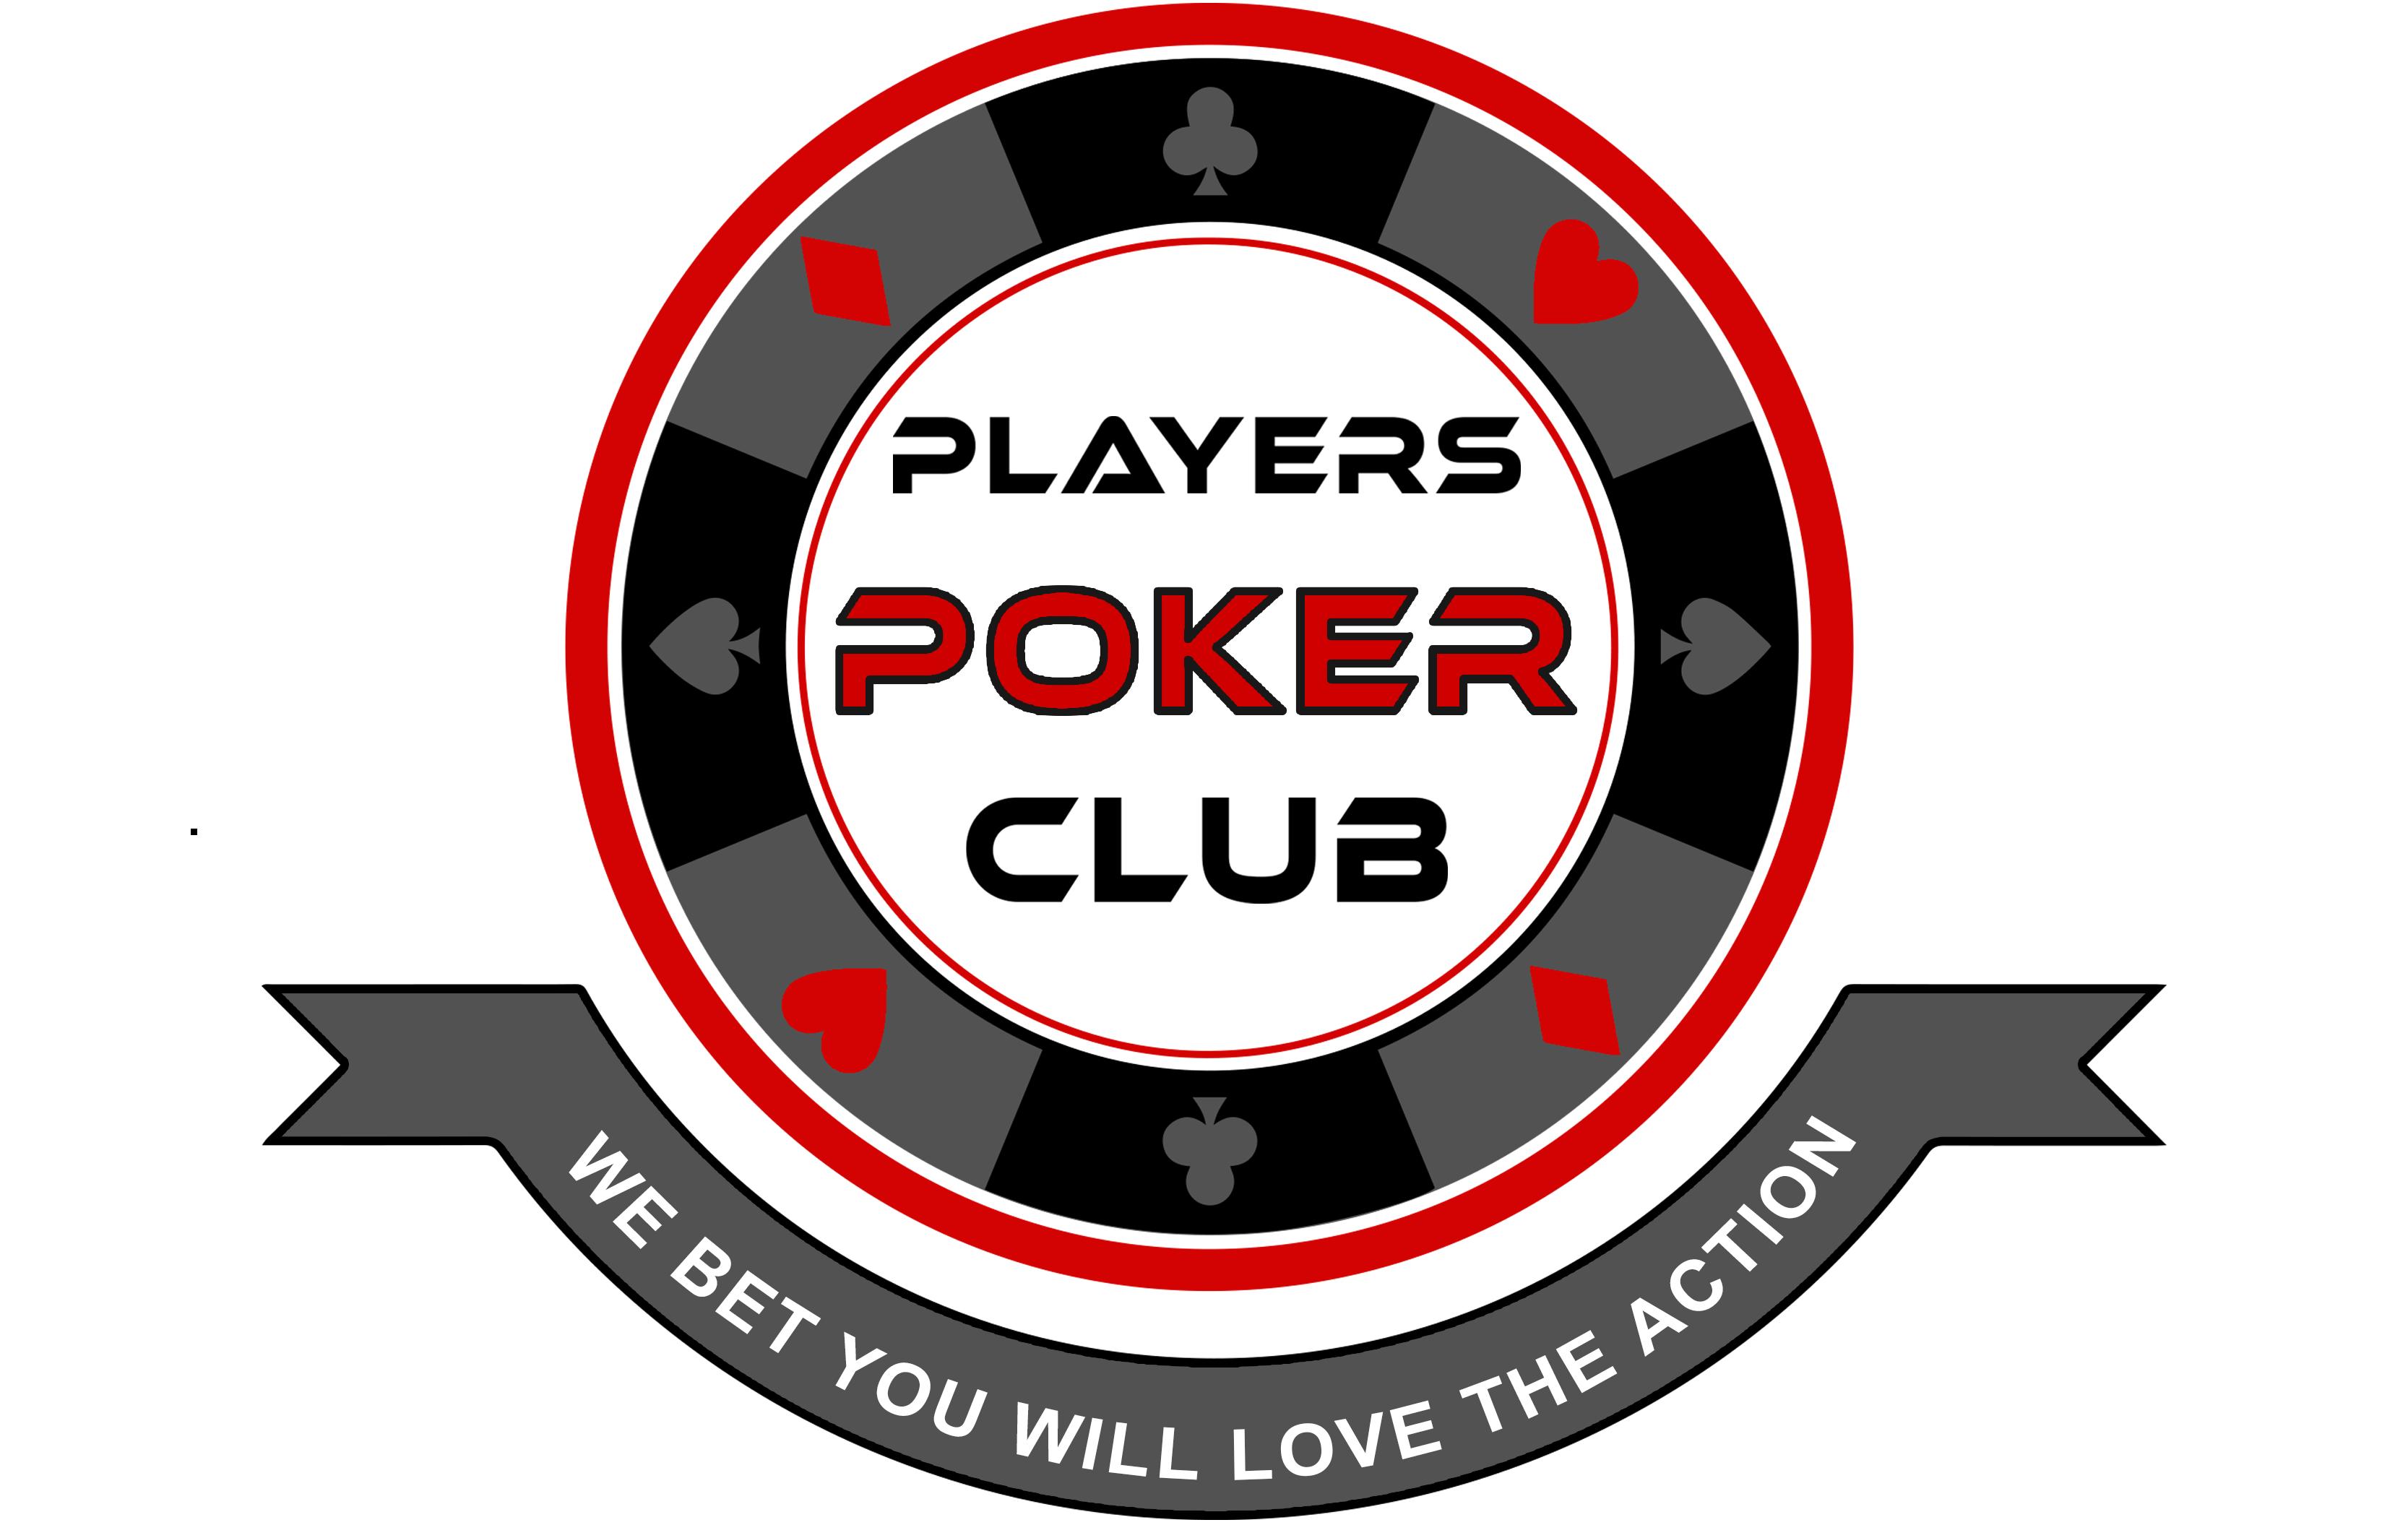 Players Poker Club